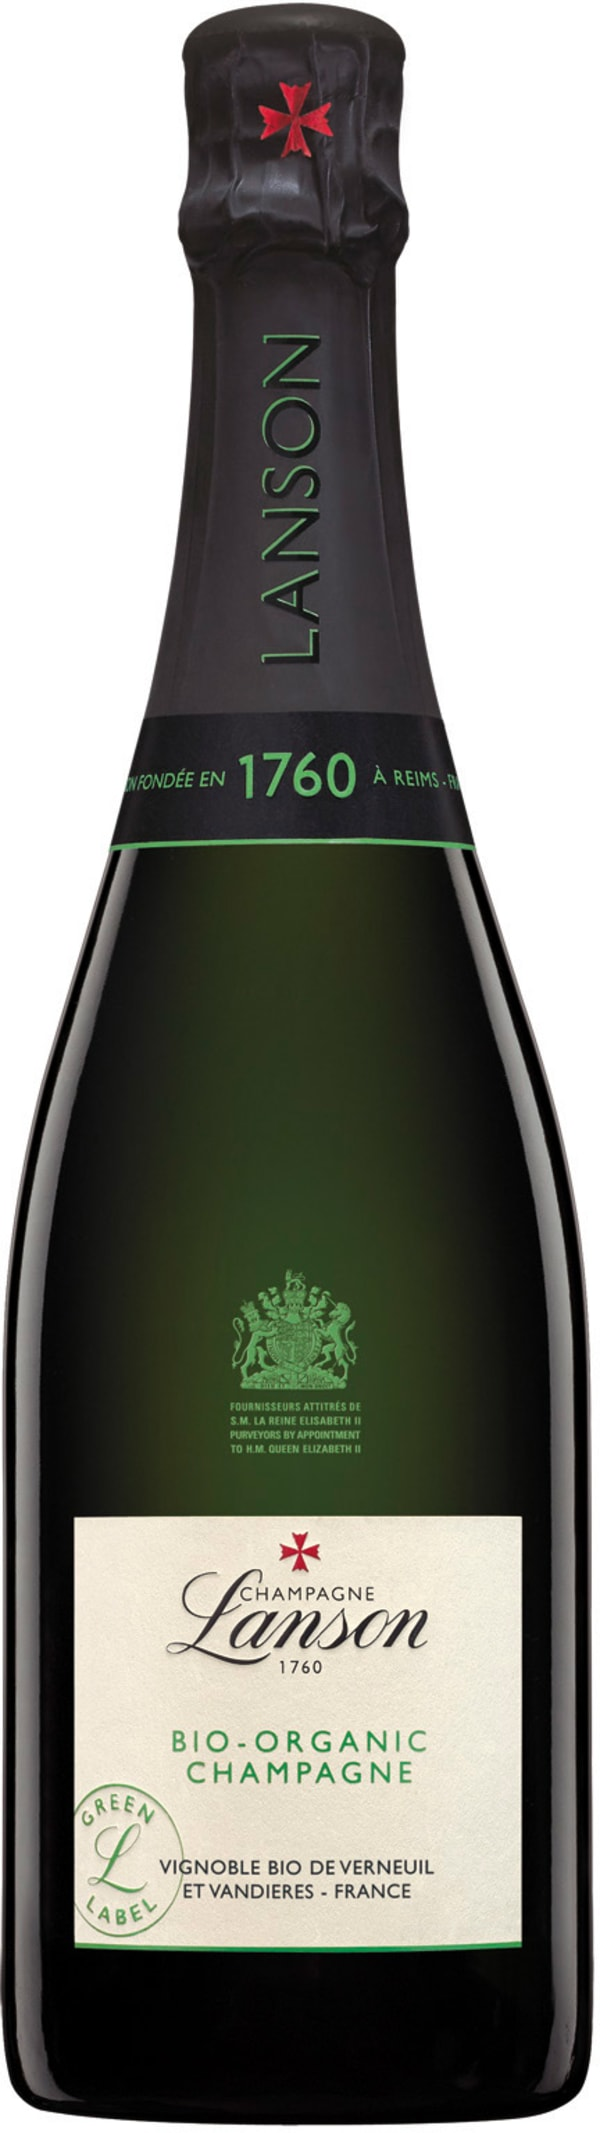 Lanson Green Label Bio-Organic Champagne Brut